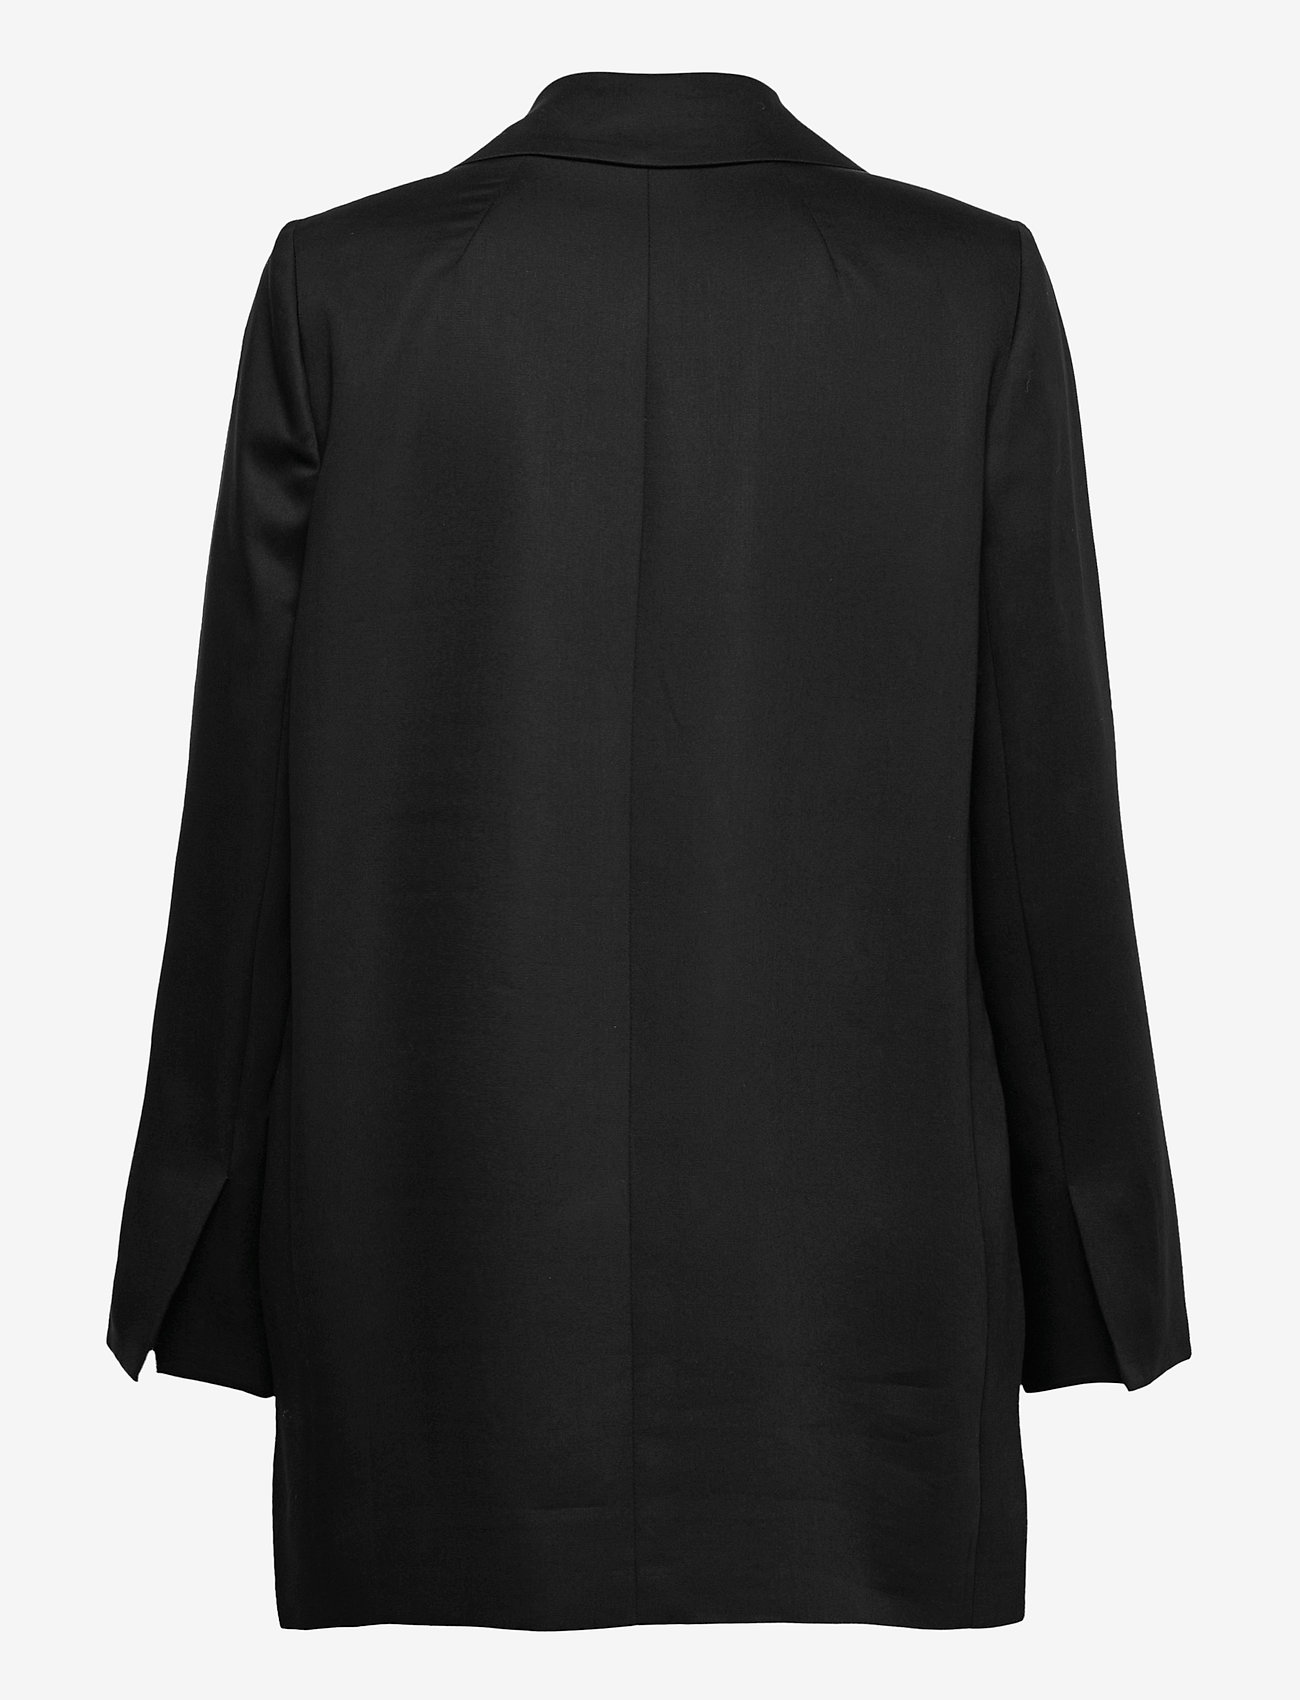 Mother of Pearl - MORGAN JACKET - oversized blazers - black - 1